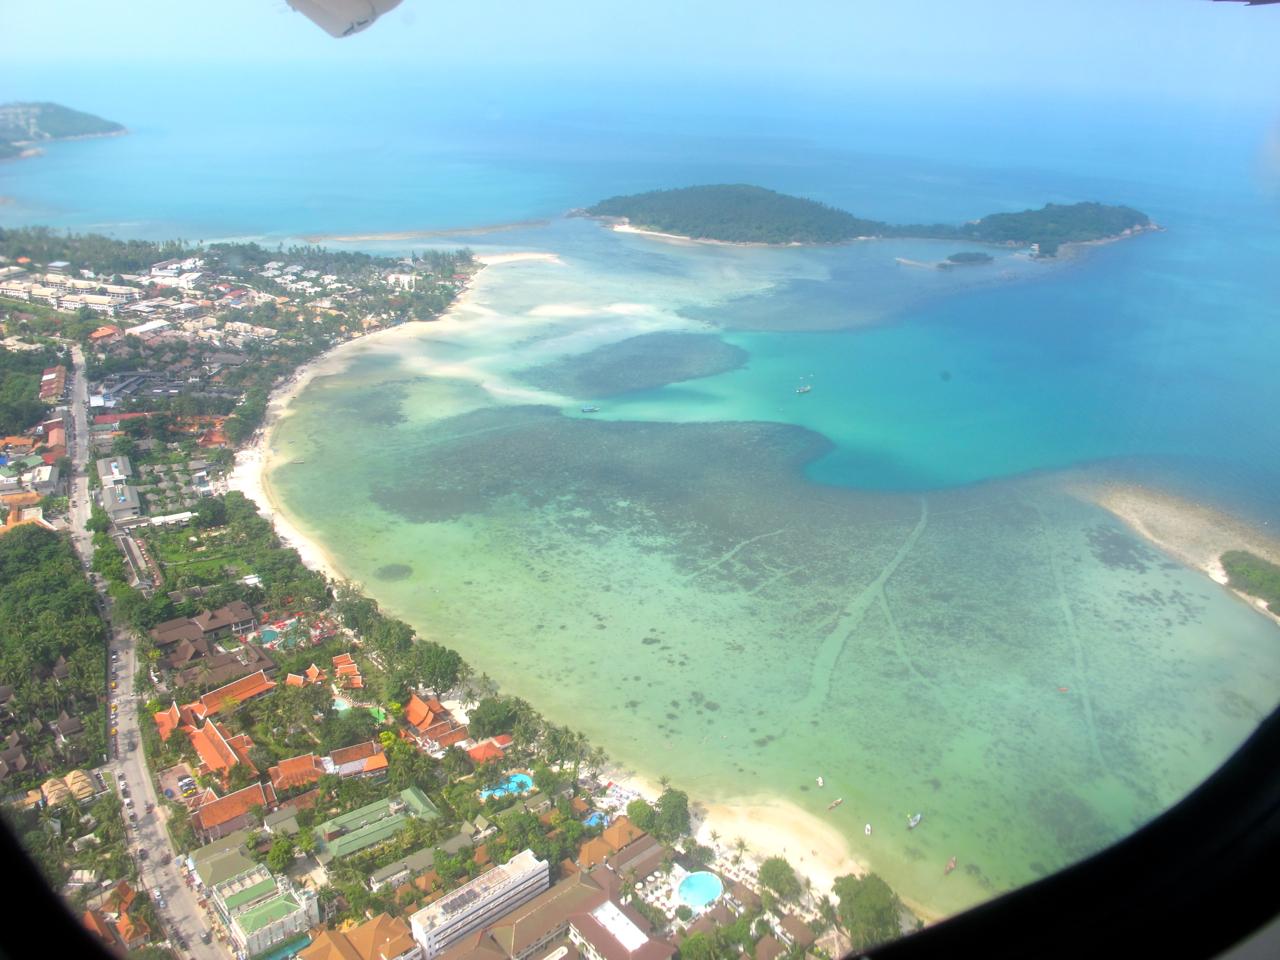 Ko Samui aerial photograph